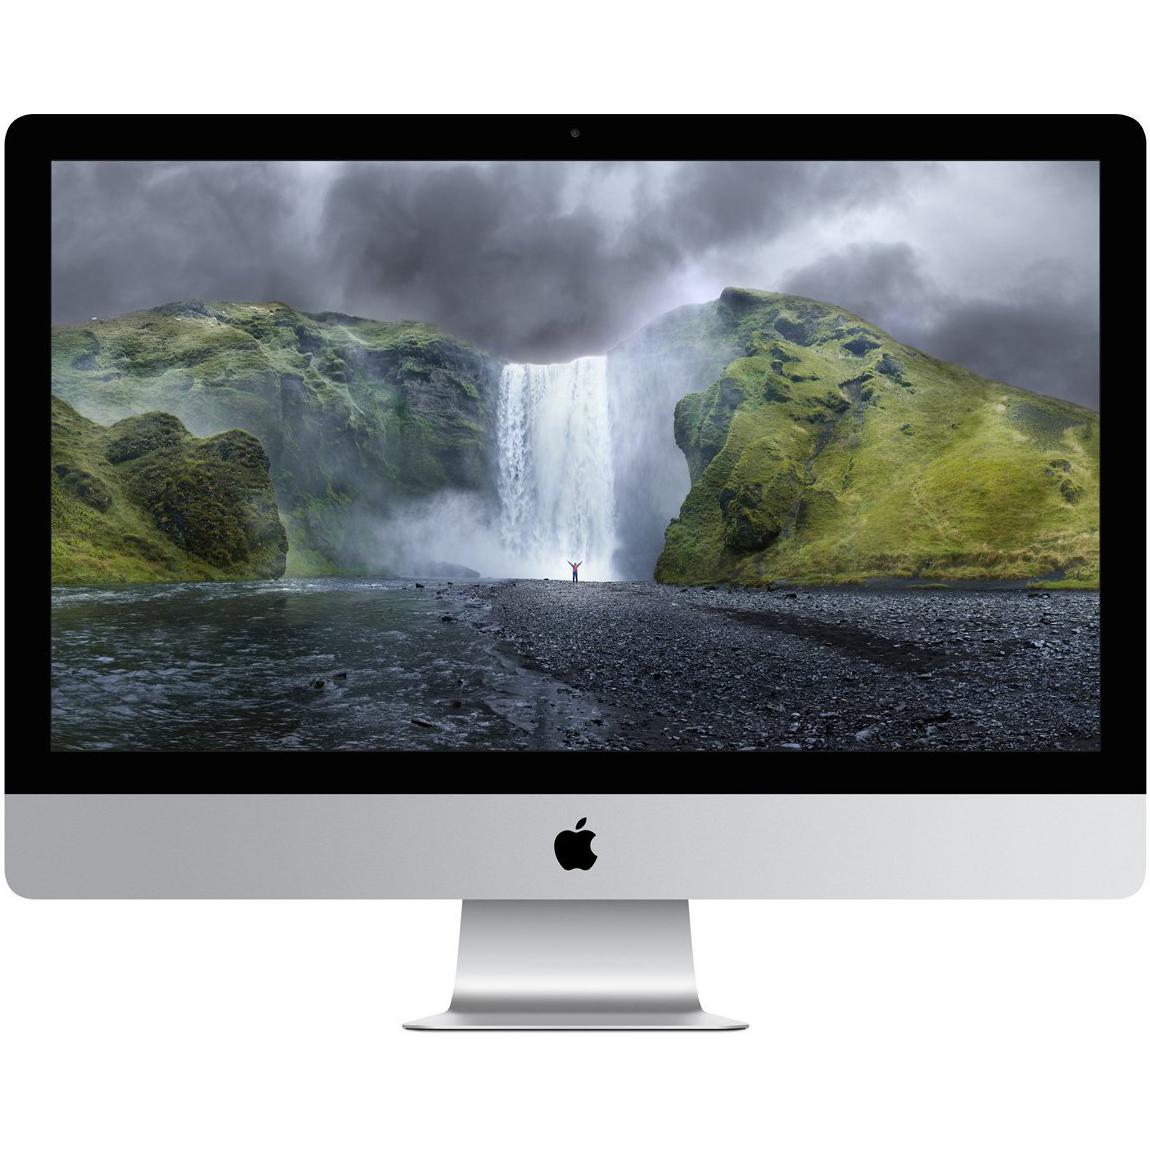 Apple 24  iMac MB325LL A, Core 2 Duo, 2GB Memory, 320GB HDD (Grade C)